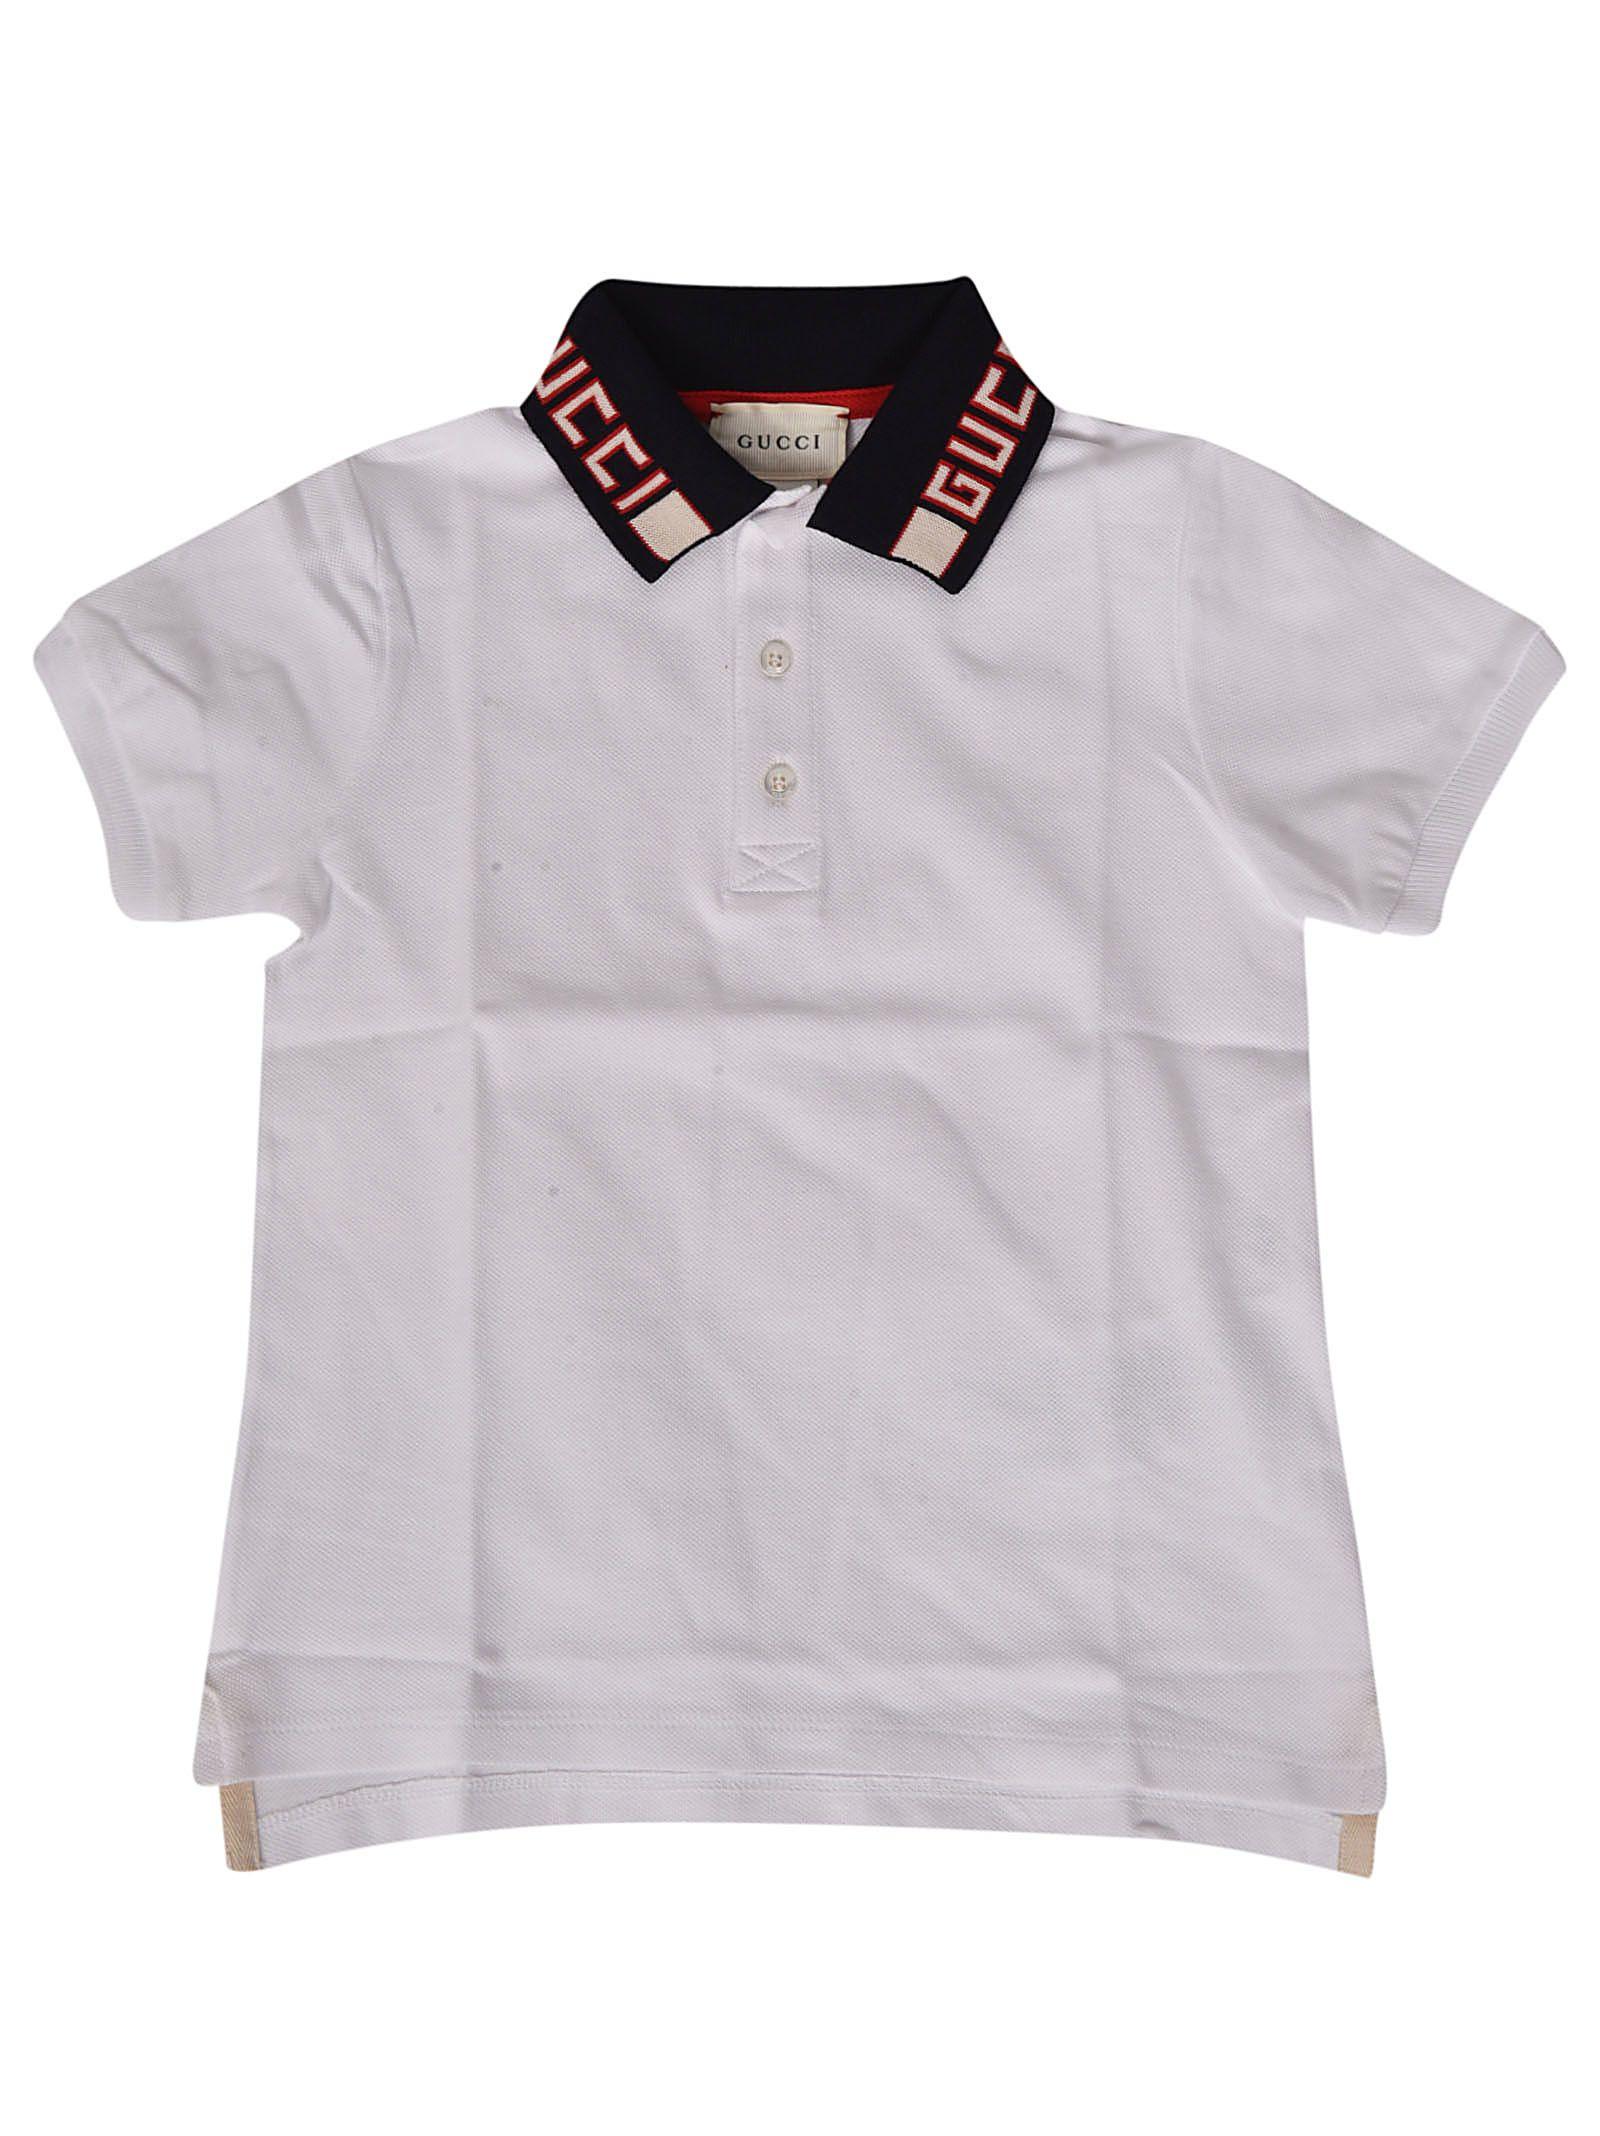 49c32e9ba Gucci Gucci Logo Collar Polo Shirt - White - 10913752 | italist